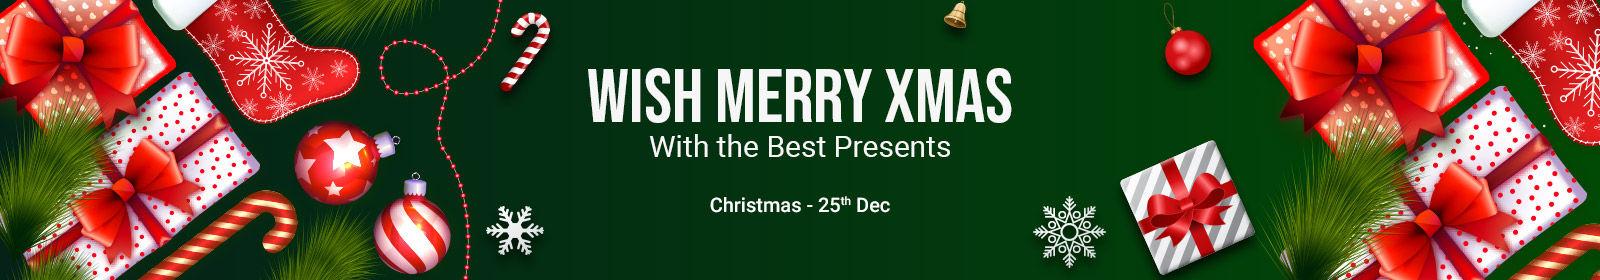 Send Christmas Gifts to UK